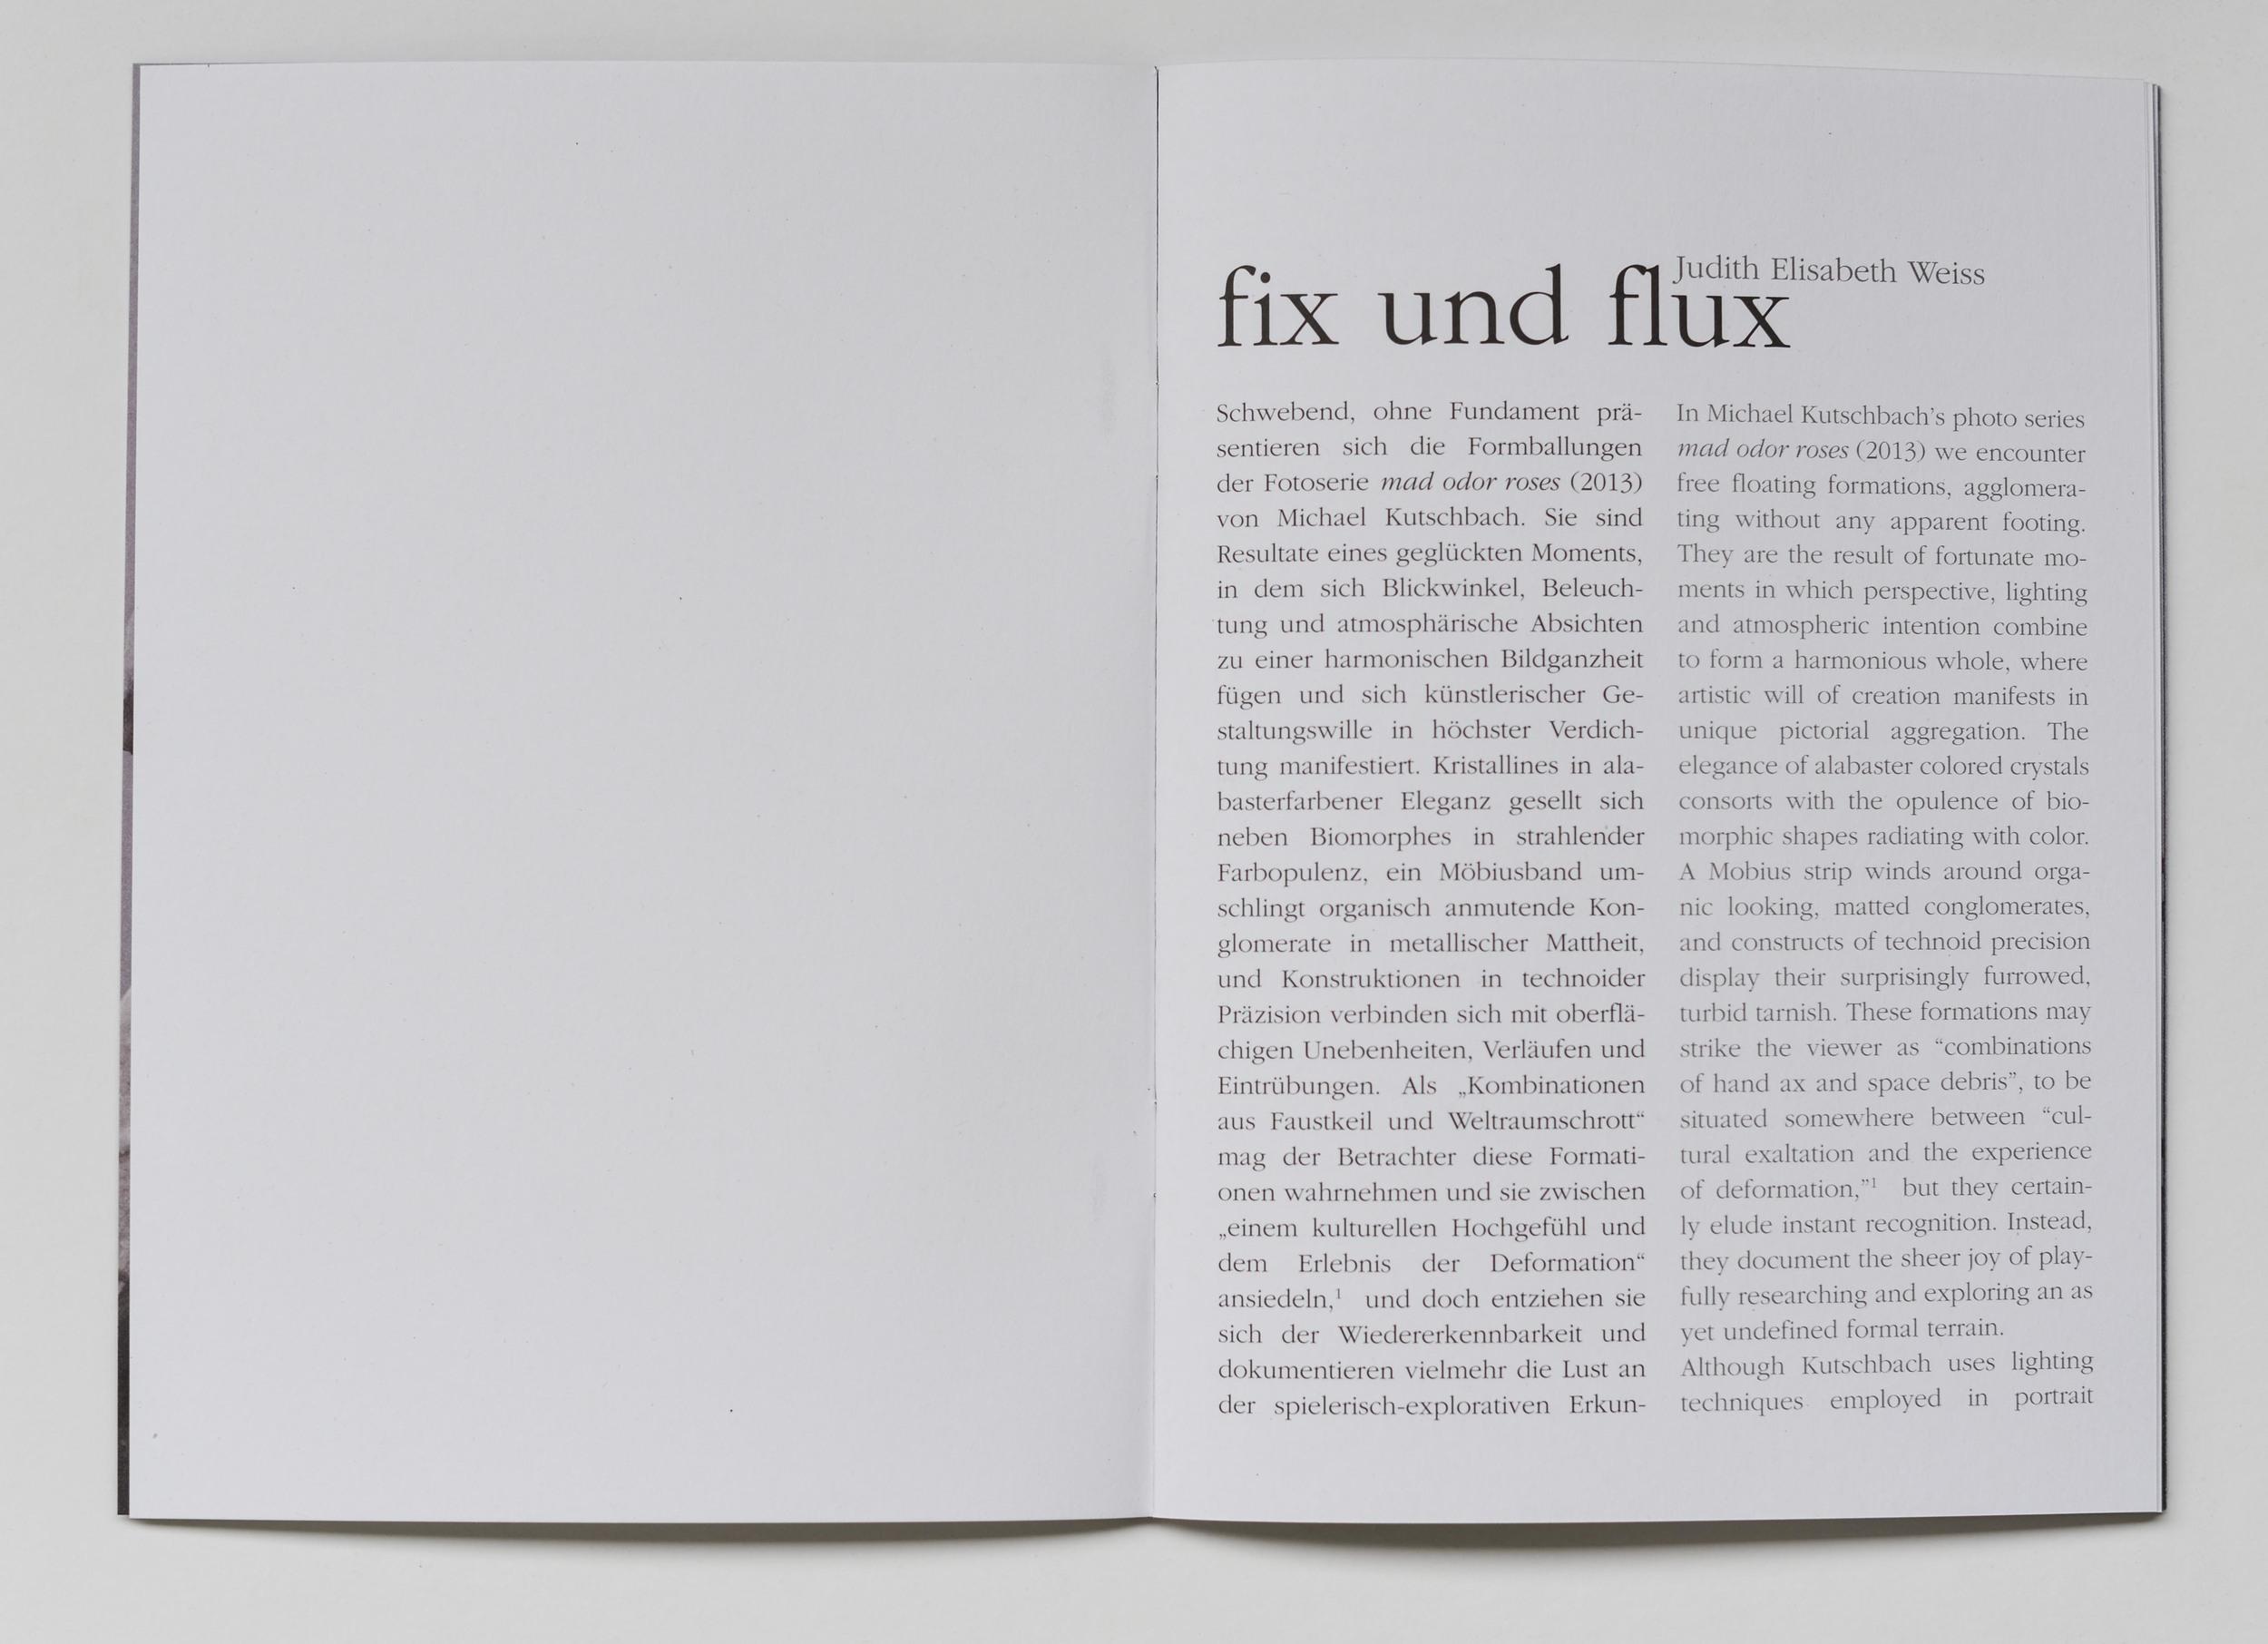 michael kutschbach mad odor roses catalogue-3.jpg